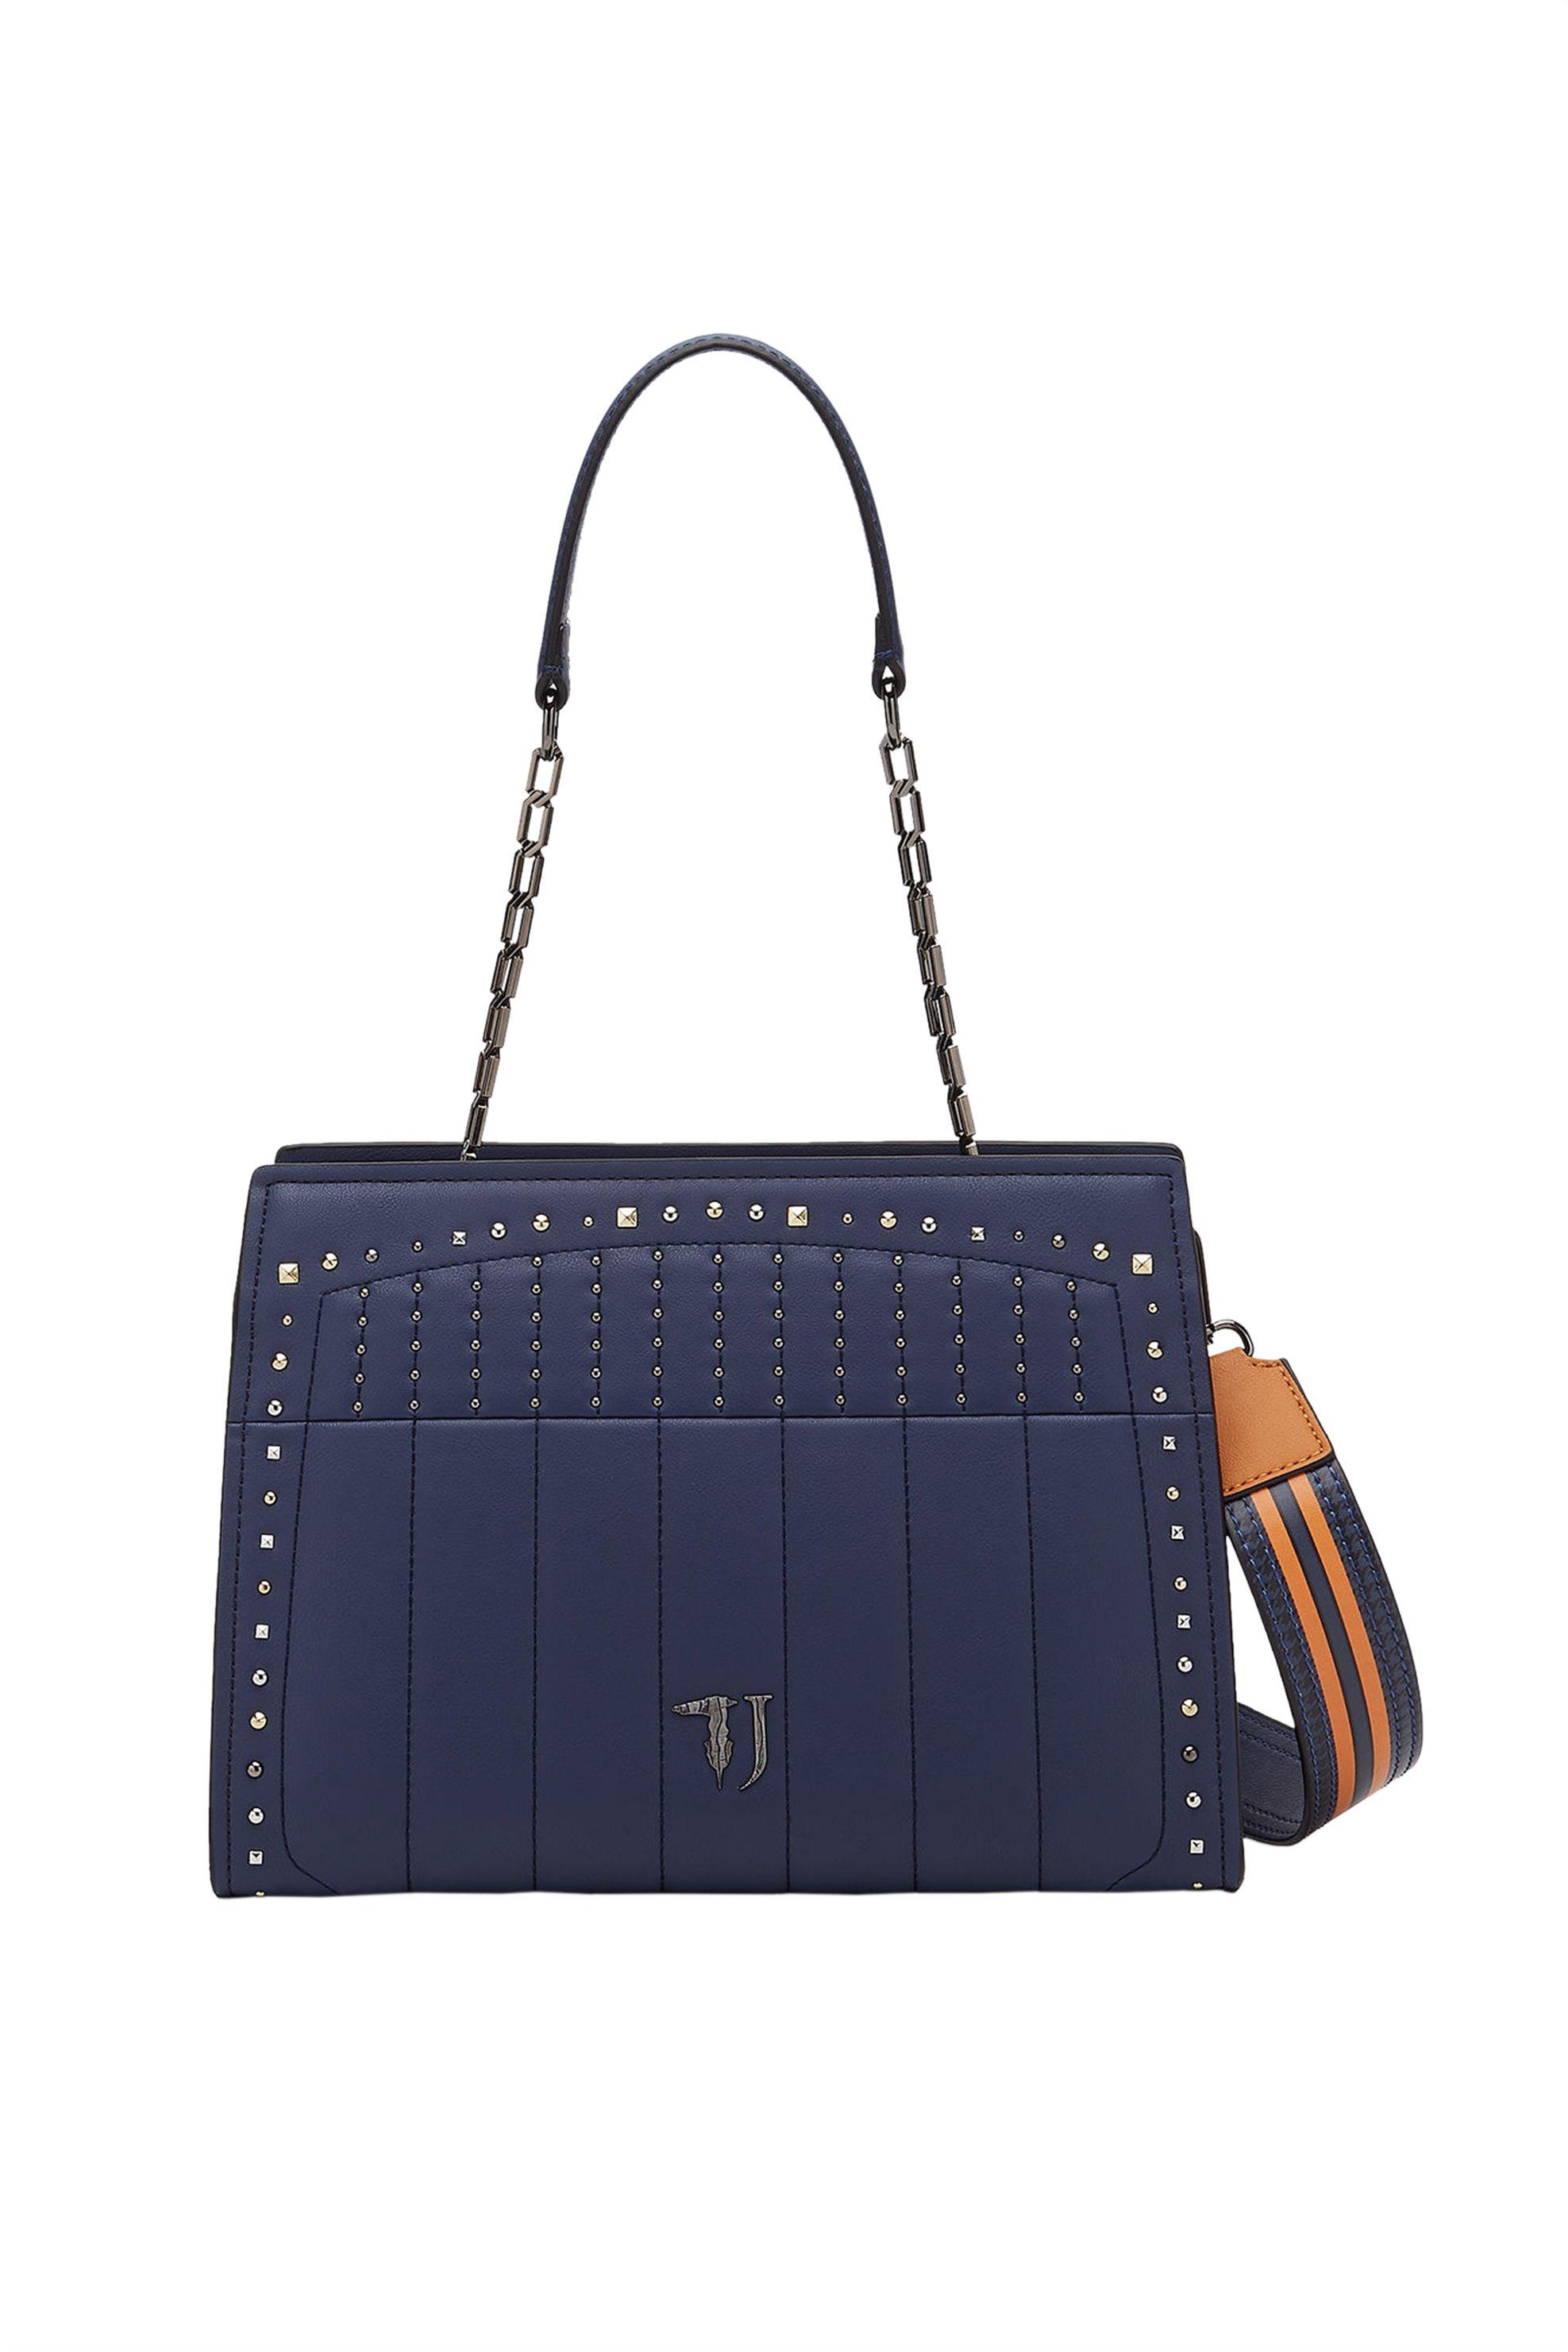 Trussardi Jeans tote bag Curcuma καπιτονέ - 75B00505-9Y099999 - Μπλε Σκούρο γυναικα   τσαντεσ   ώμου   shopper bags